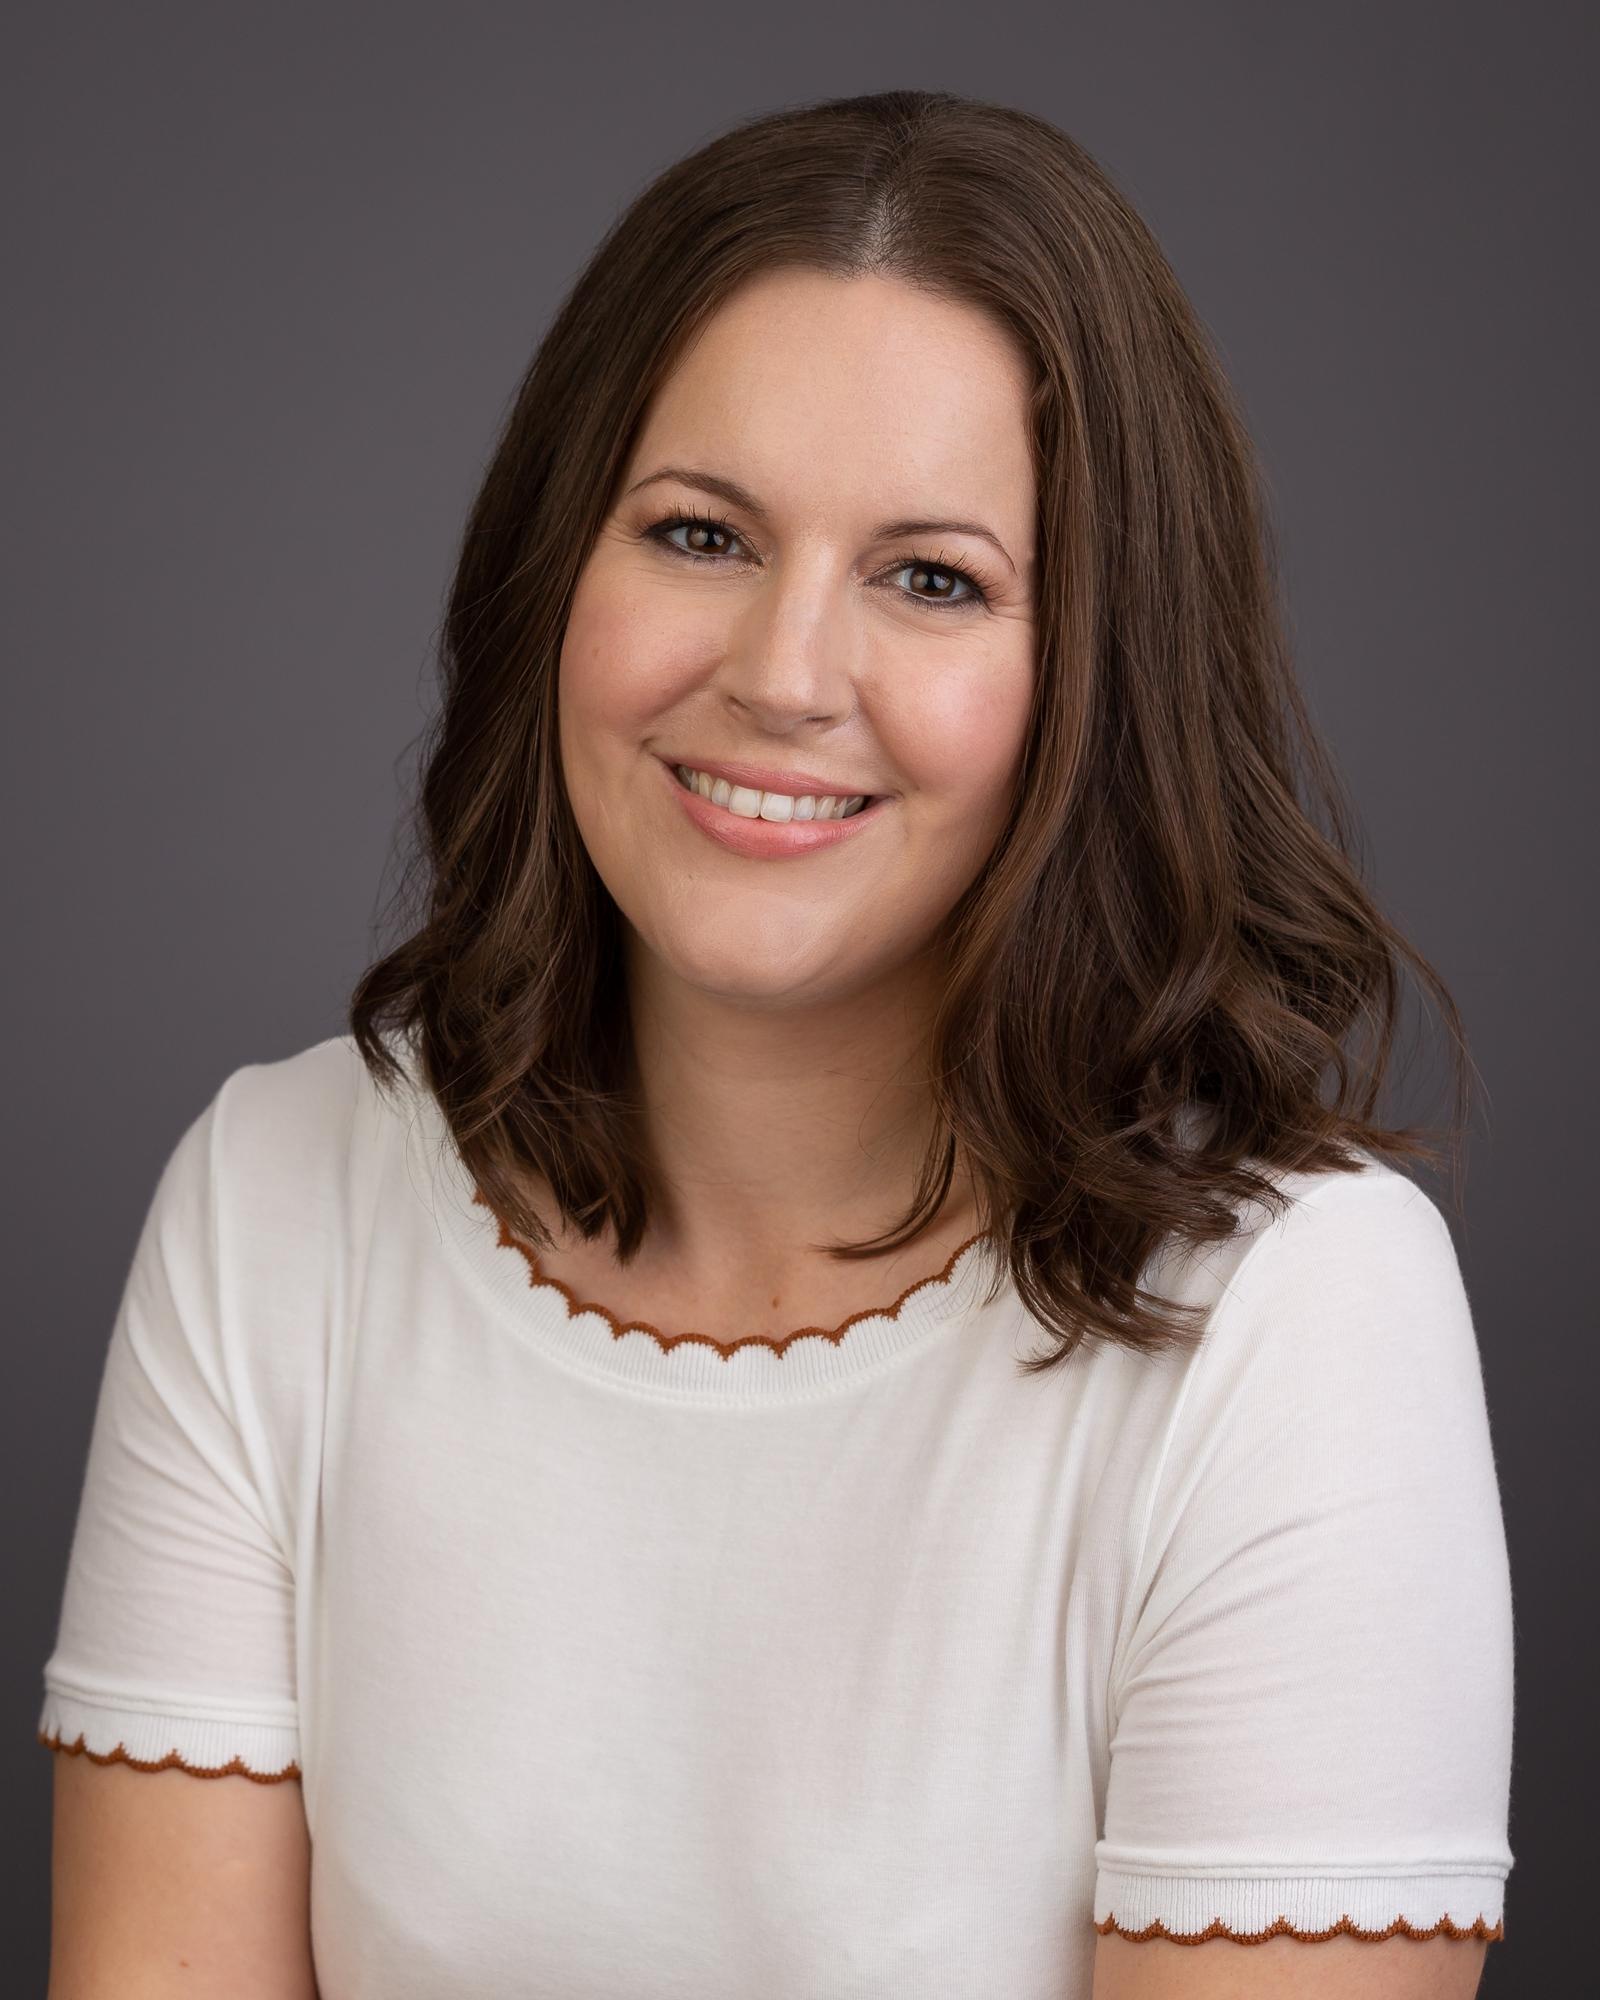 Miranda Malins